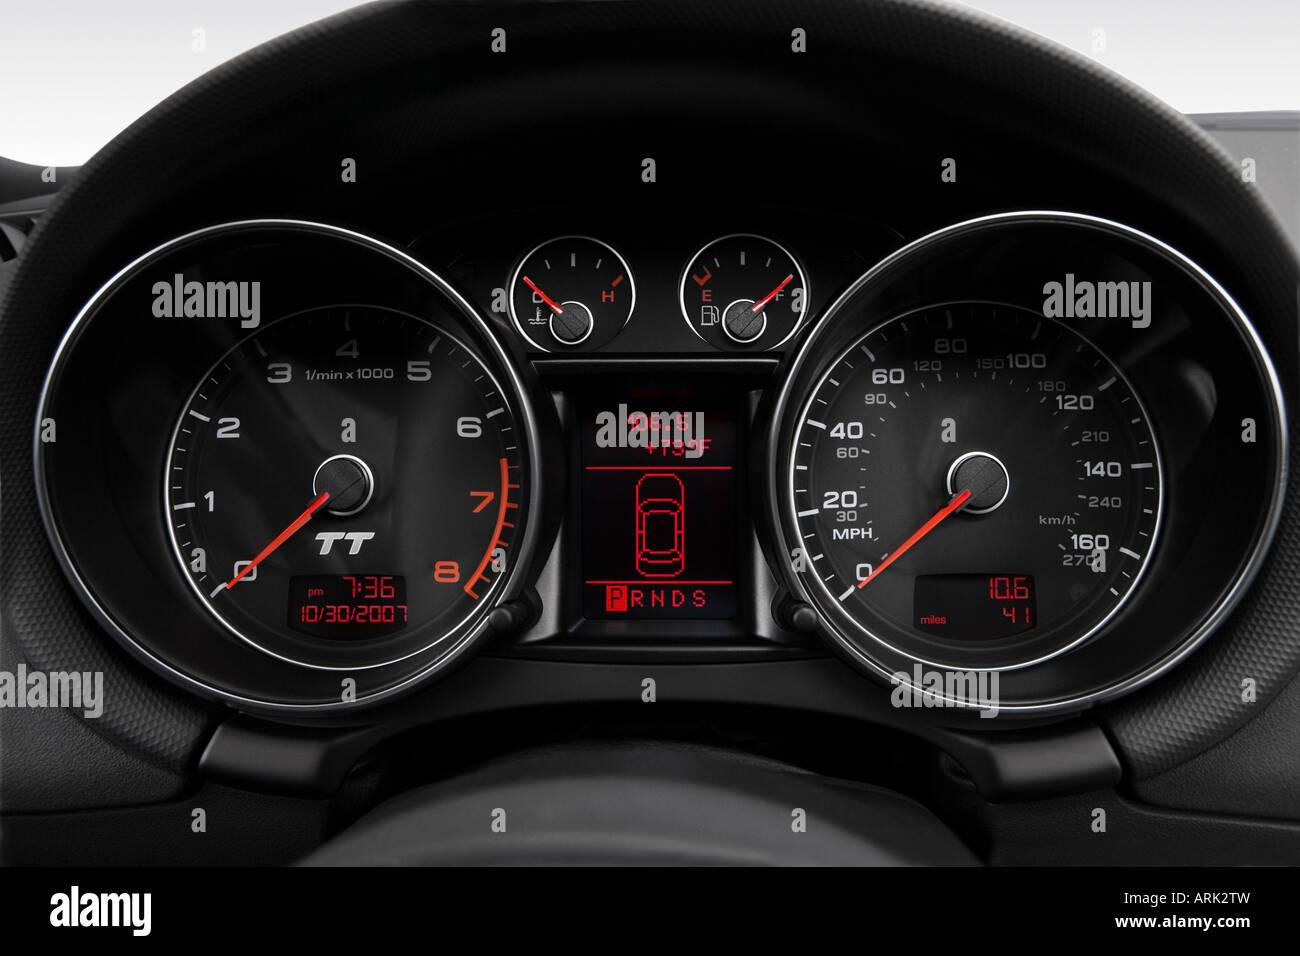 2008 audi tt 2.0t in black - speedometer/tachometer stock photo